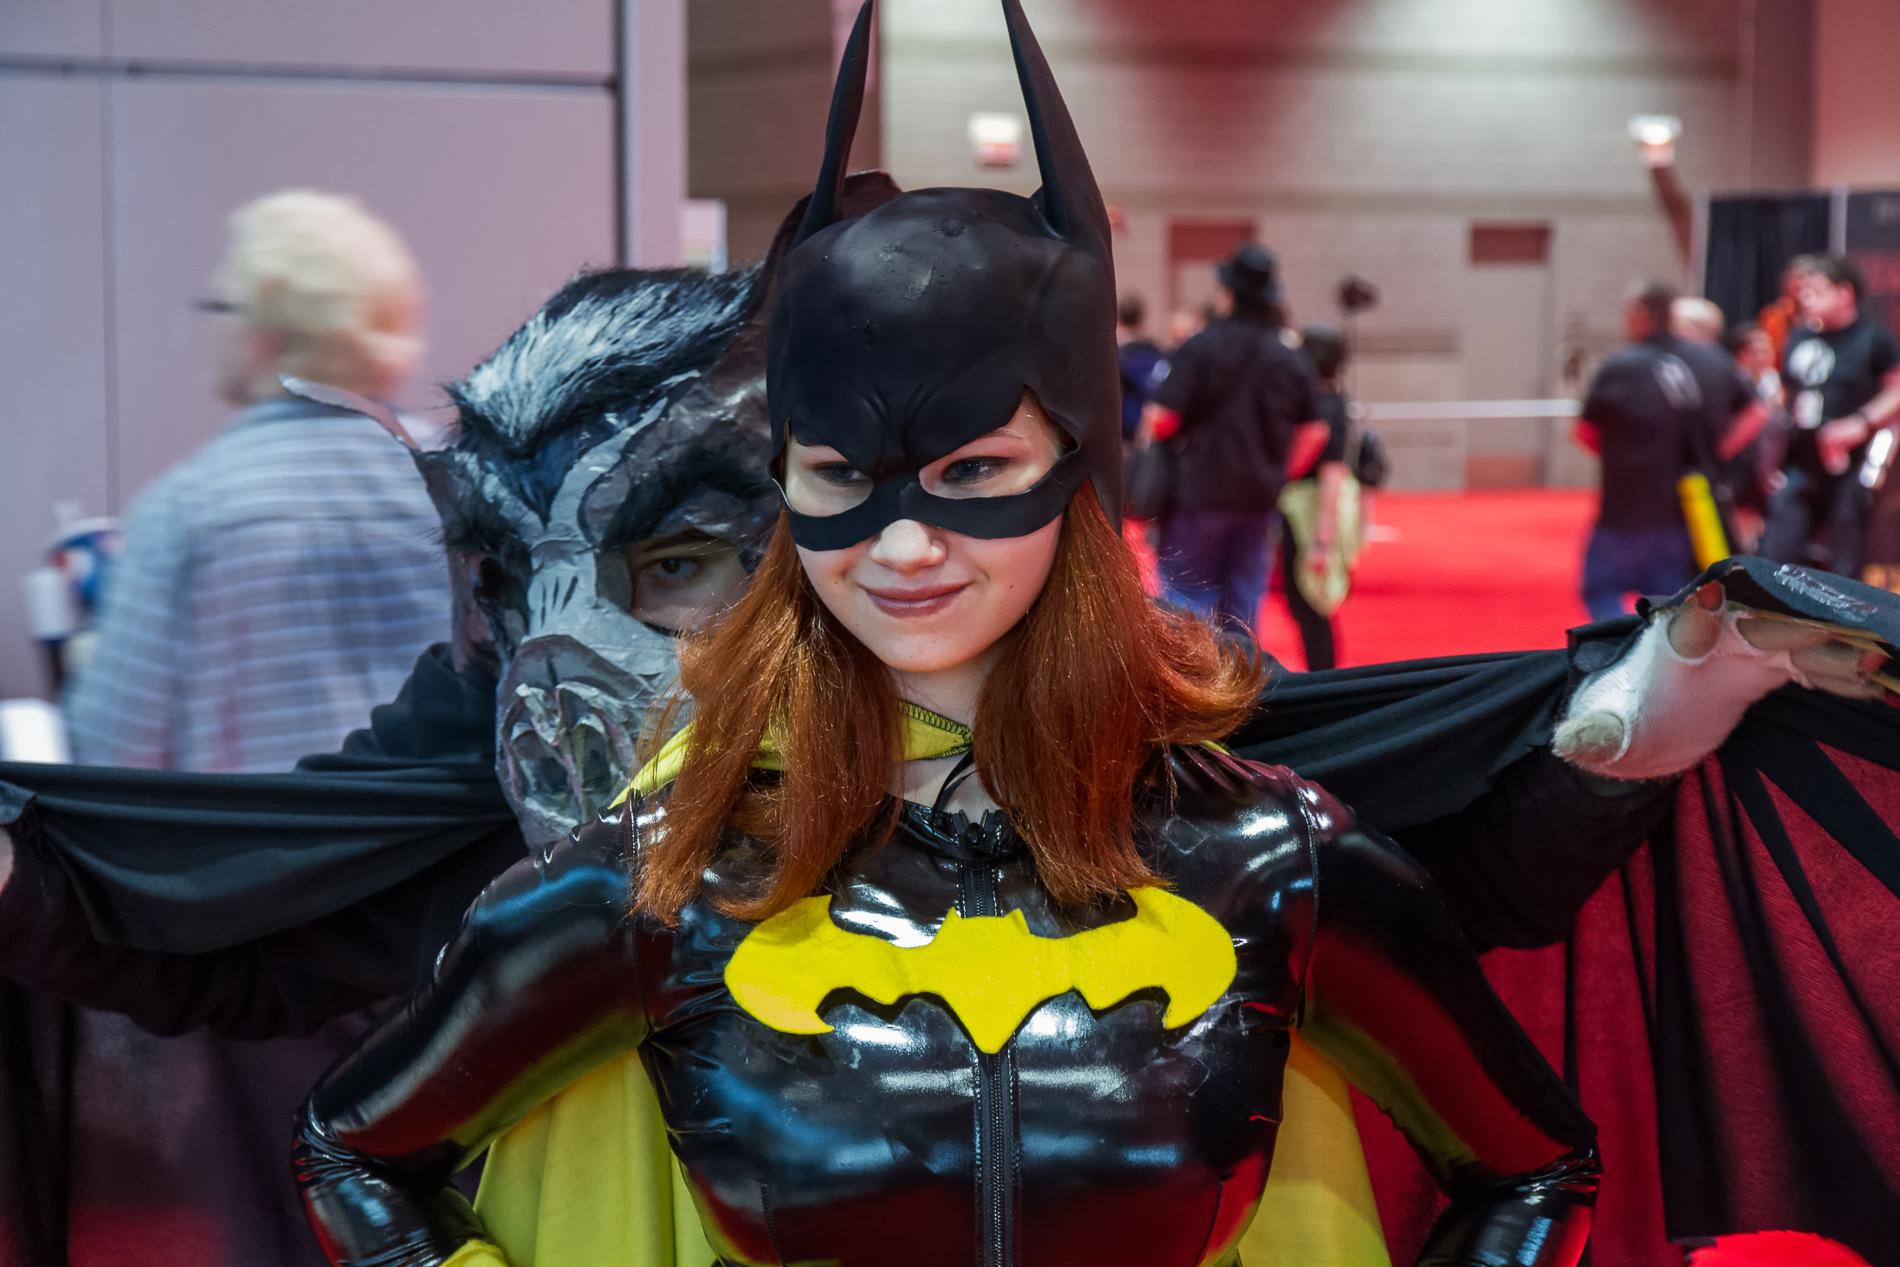 File:Batgirl with bat at C2E2 2013 (8707836513).jpg - Wikimedia Commons